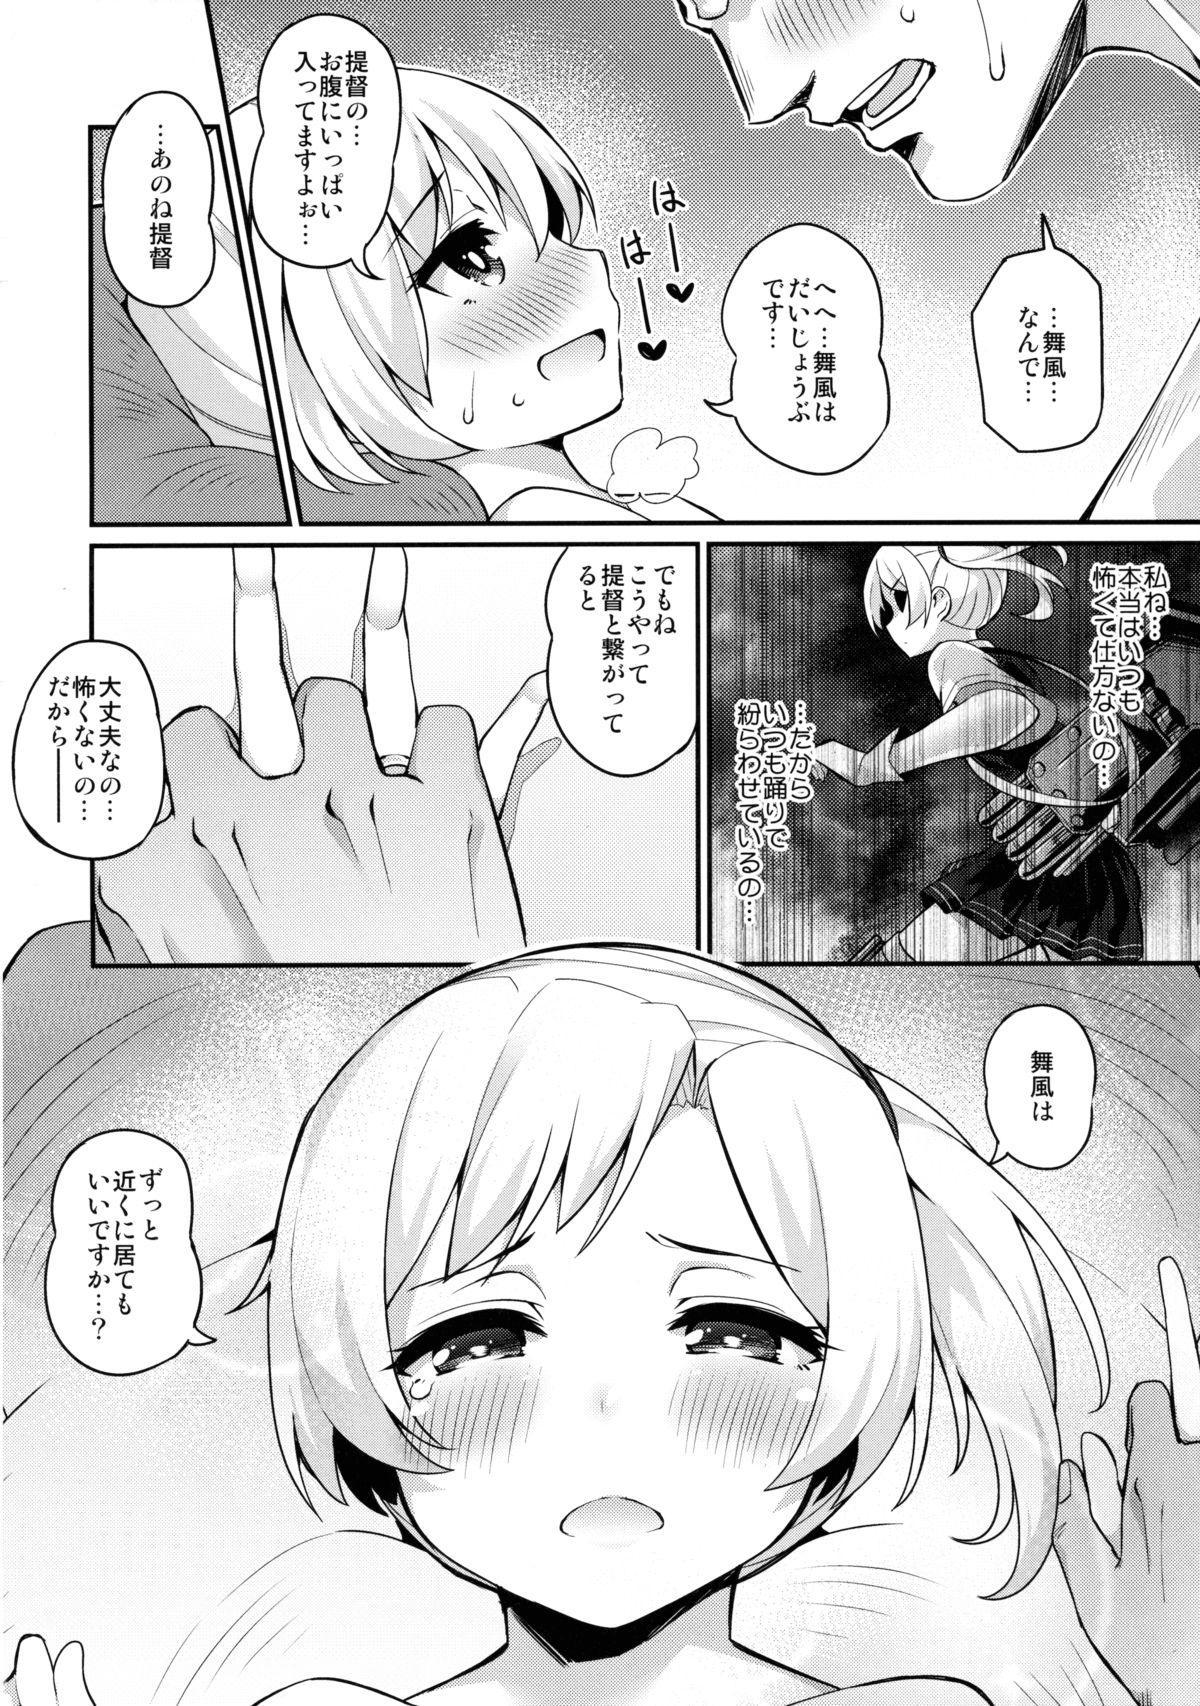 Maikaze Kekkon X-kame 16